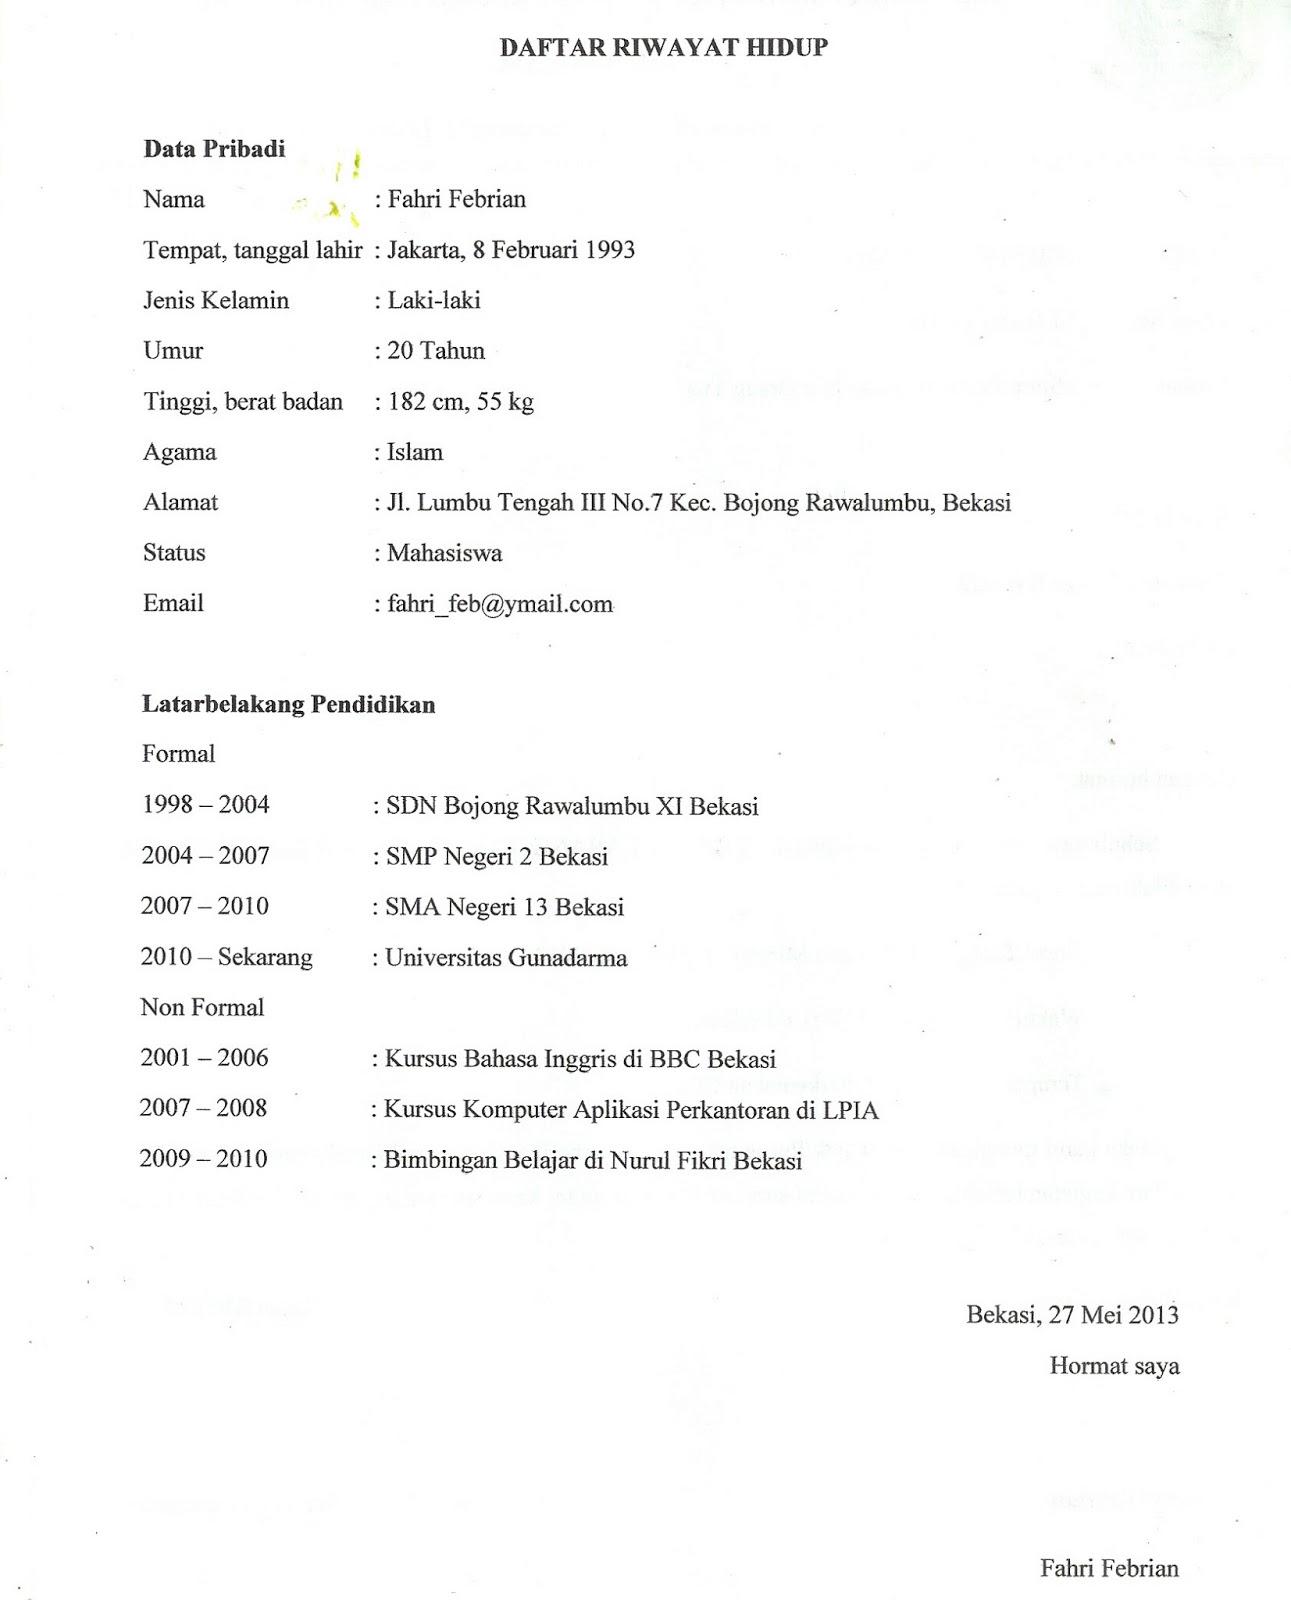 contoh essay dalam bahasa indonesia Contoh essay bahasa inggris tentang internet dan artinya contoh essay bahasa inggris tentang internet dan artinya arti dalam bahasa indonesia: saat ini.